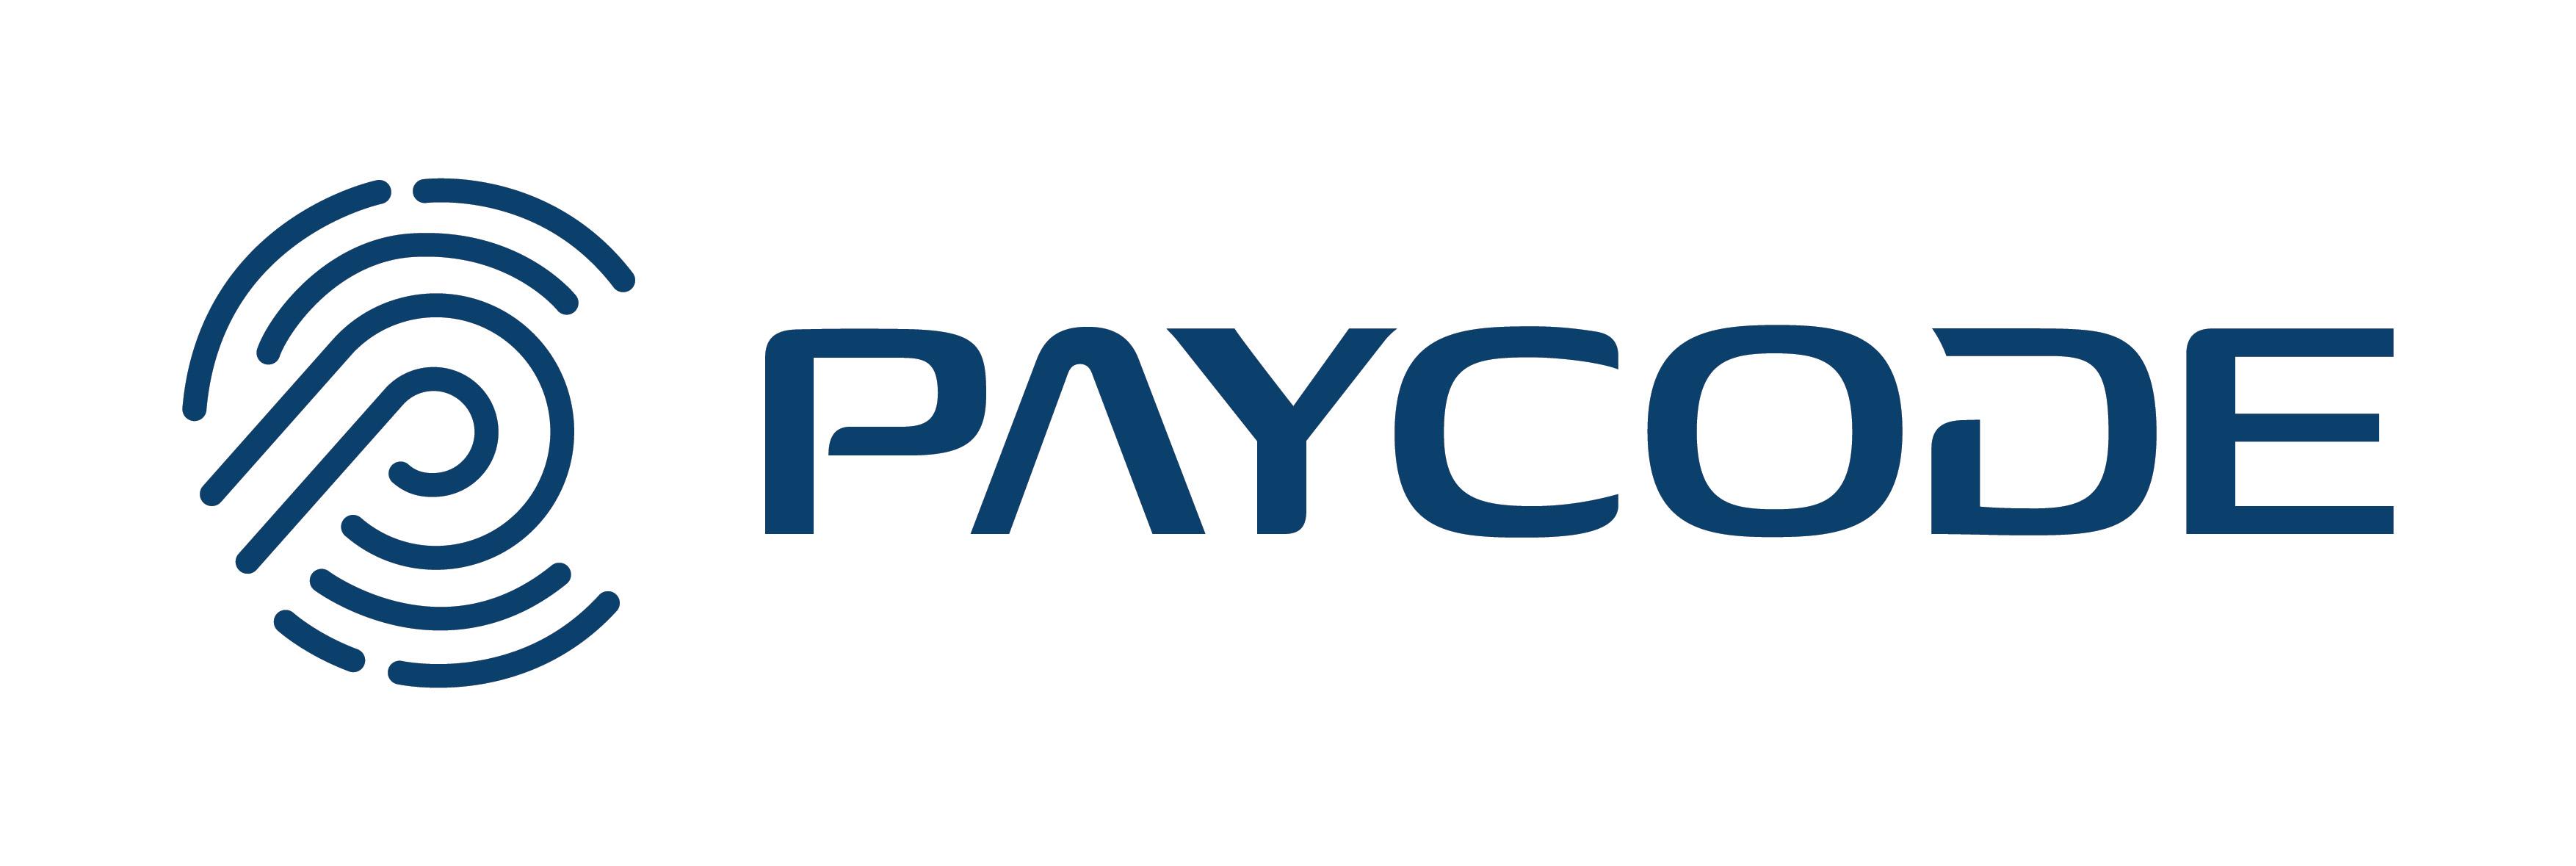 Paycode logo   hq